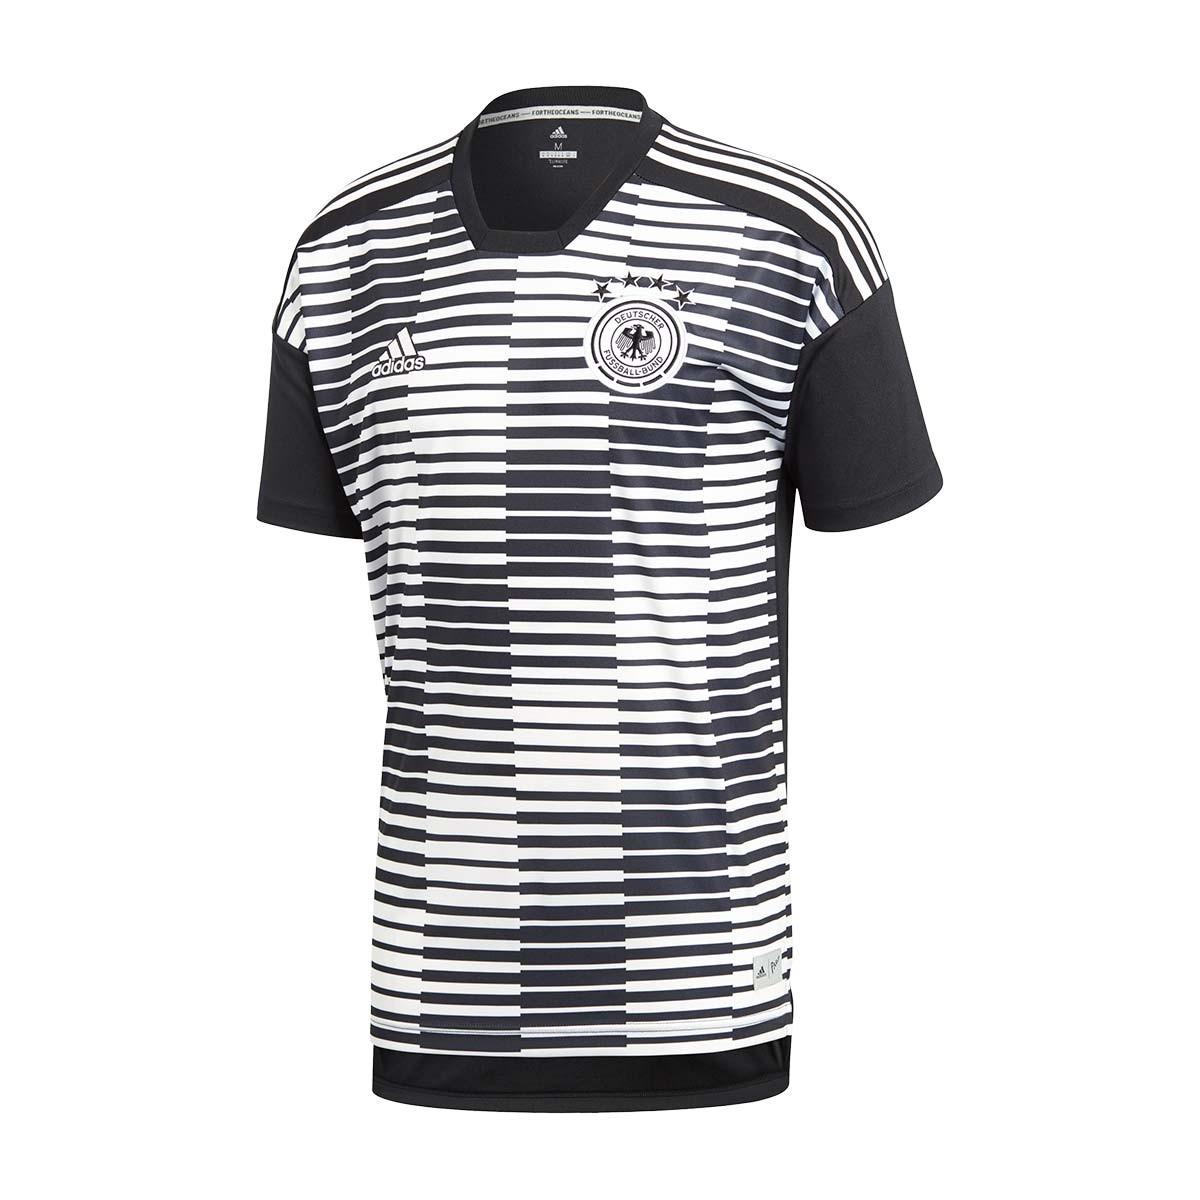 2018 Match Black Pre Camiseta 2017 Adidas White Alemania wqXOxPg